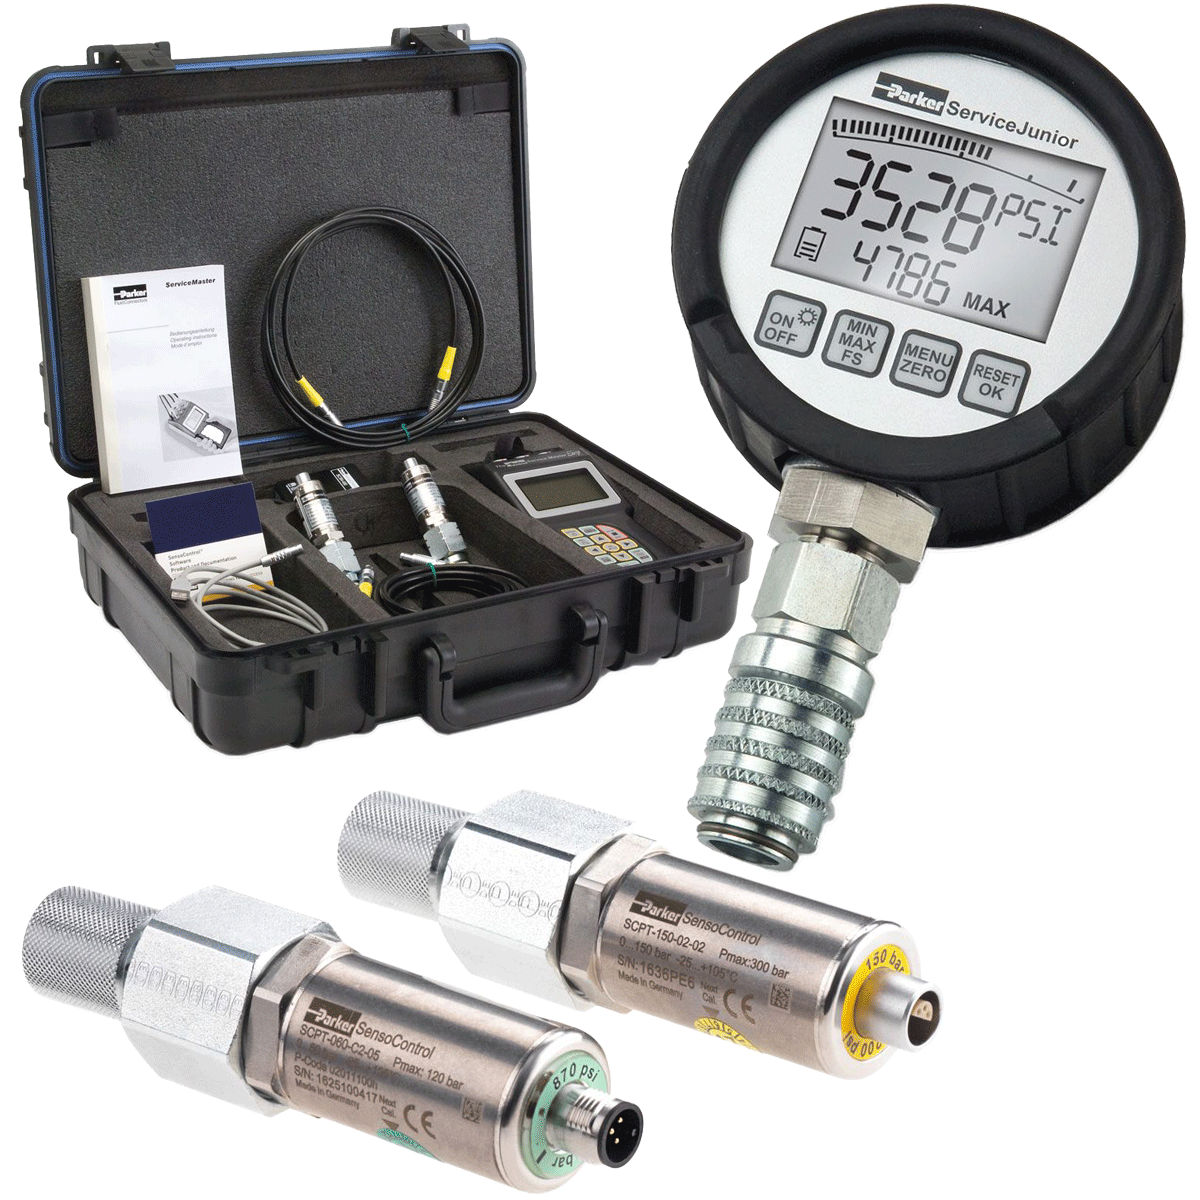 Elektronic components